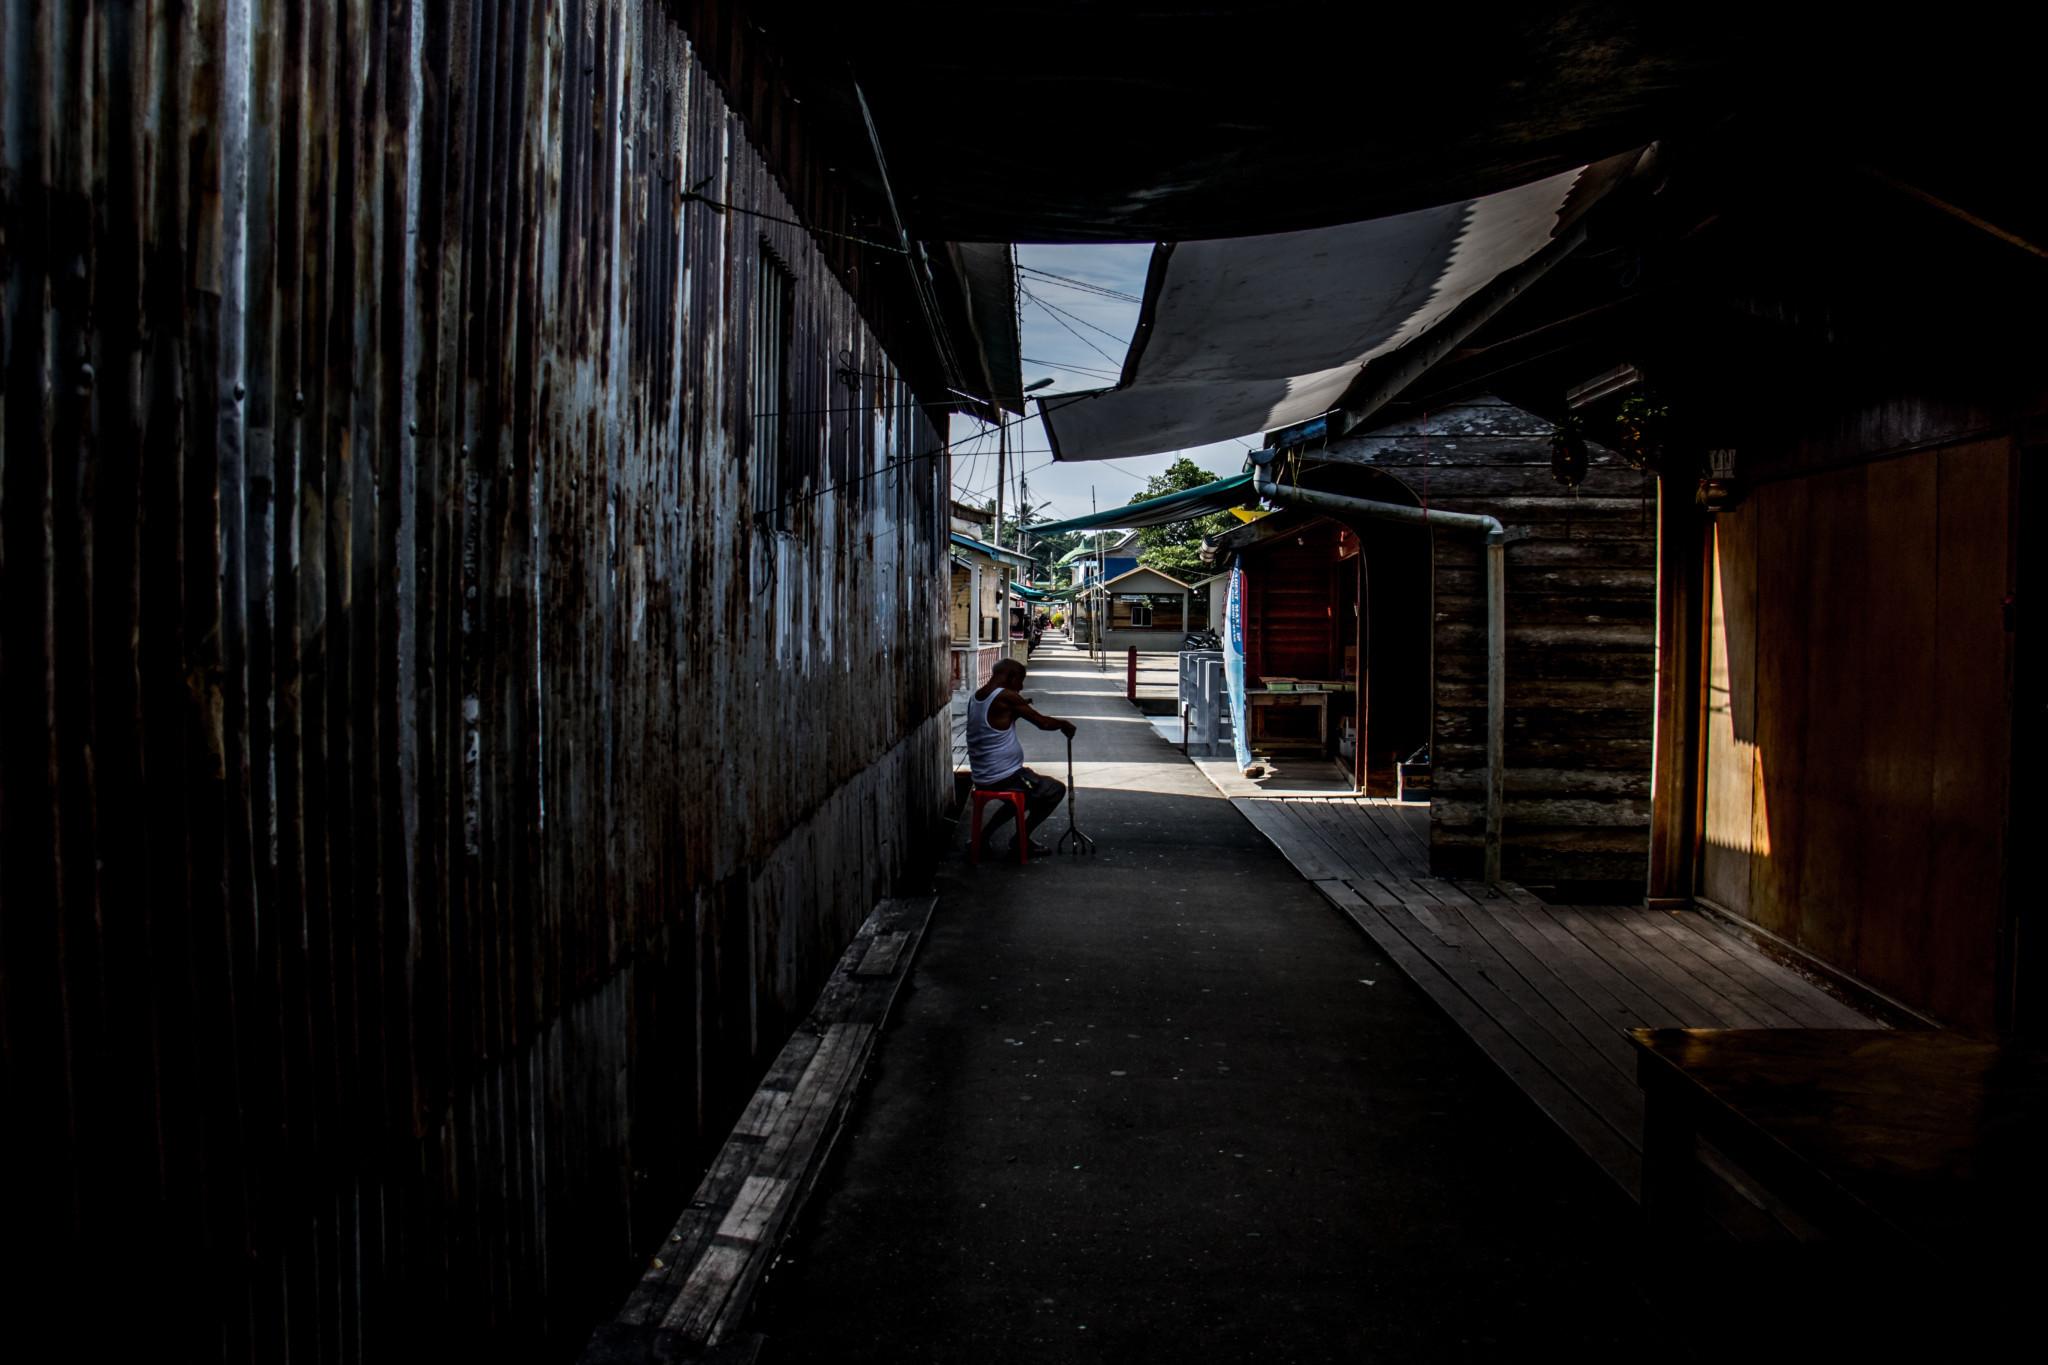 Senggarang Village, Bintan Island